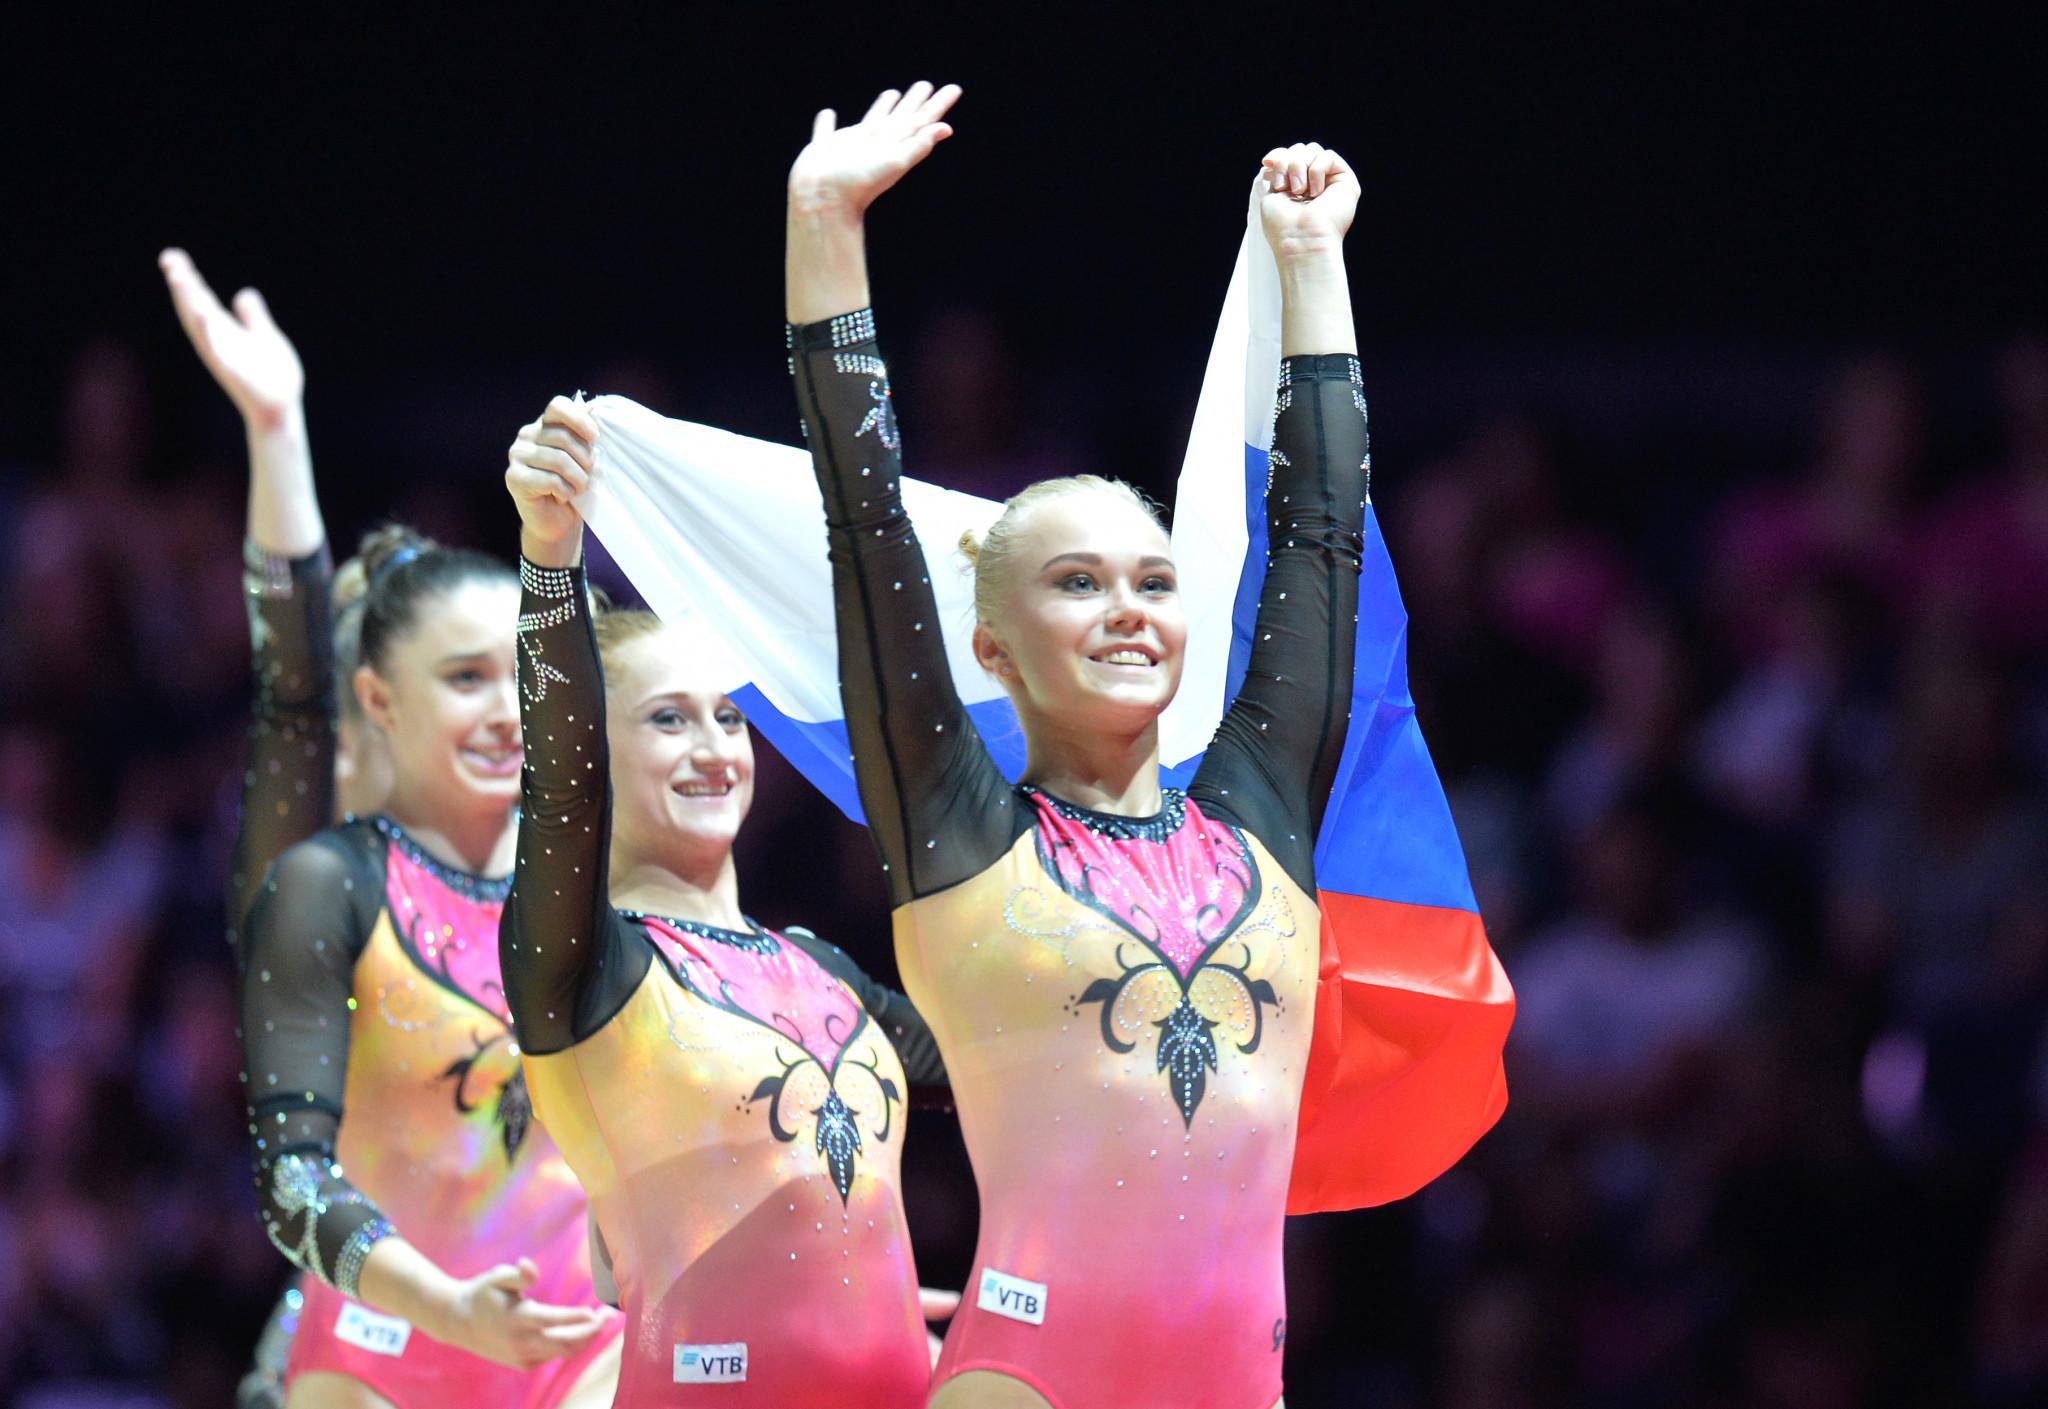 Russia retain women's artistic gymnastics team title at Glasgow 2018 European Championships